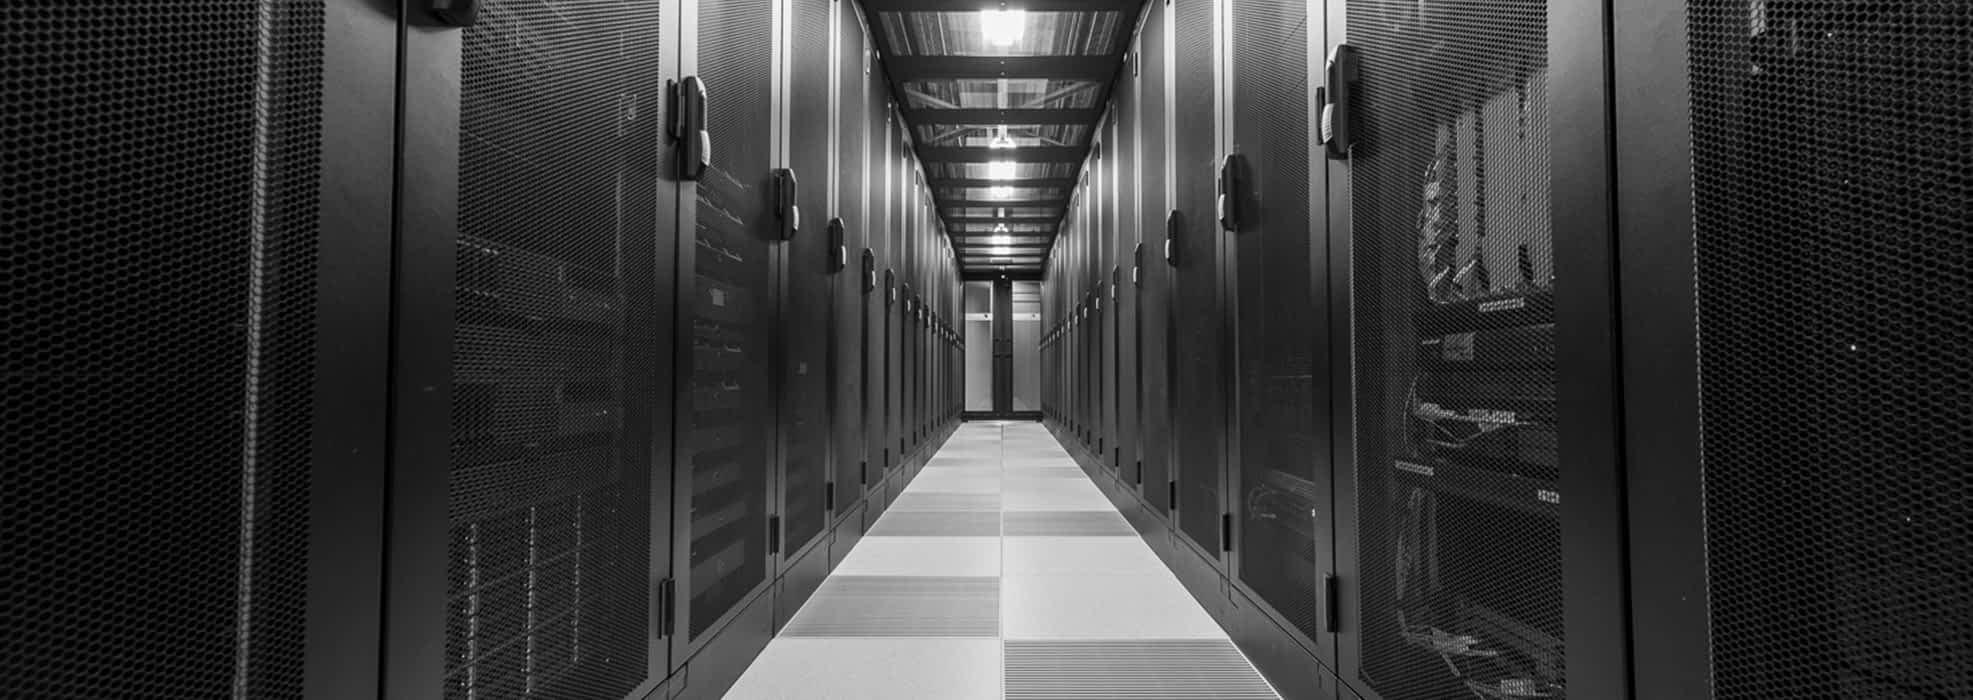 Eigen datacenter